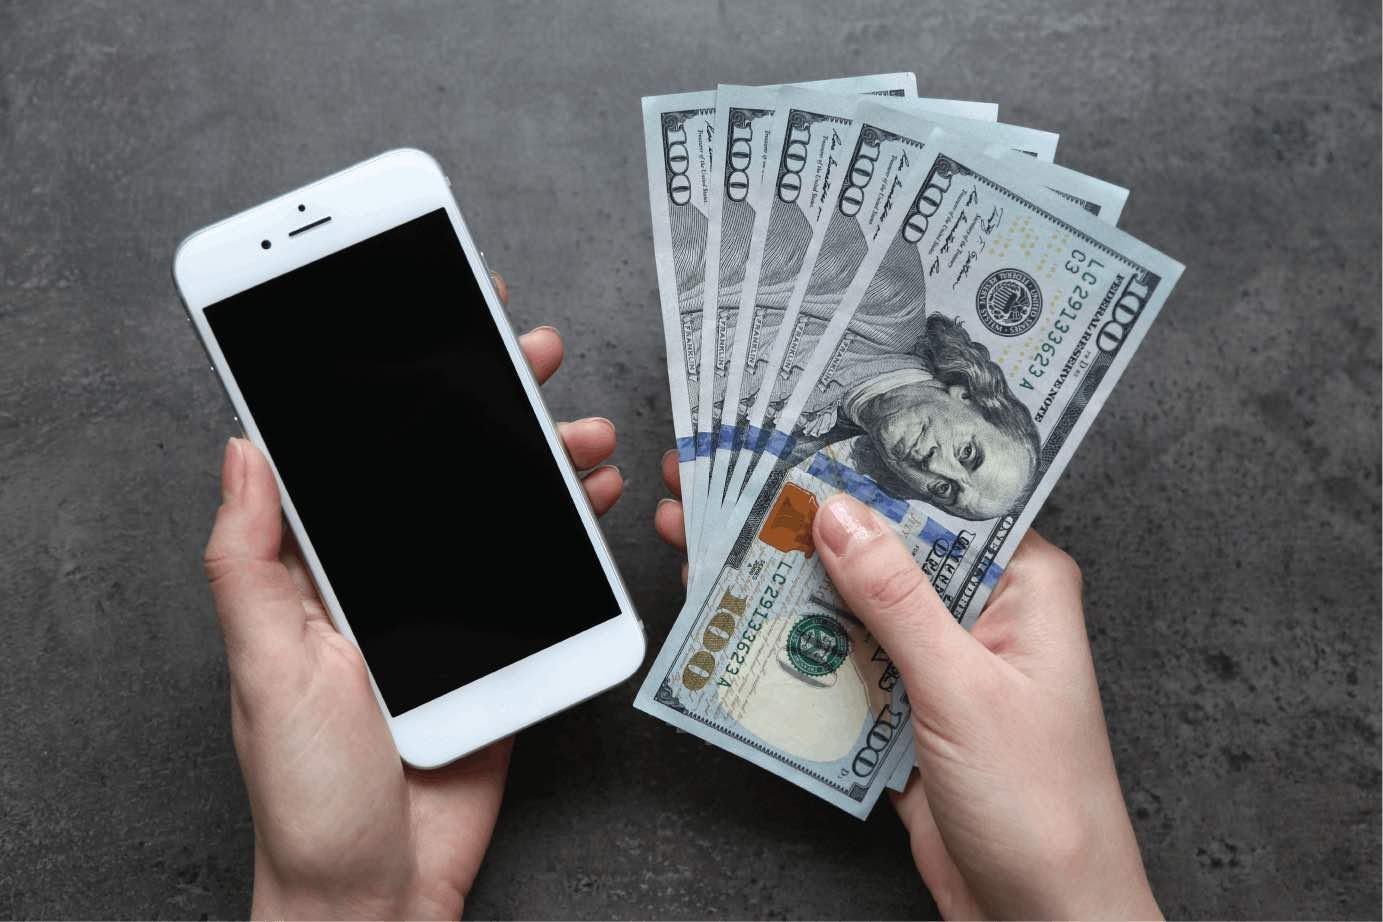 C:\Users\Seyi Adeleke\Downloads\phone-cash.jpg